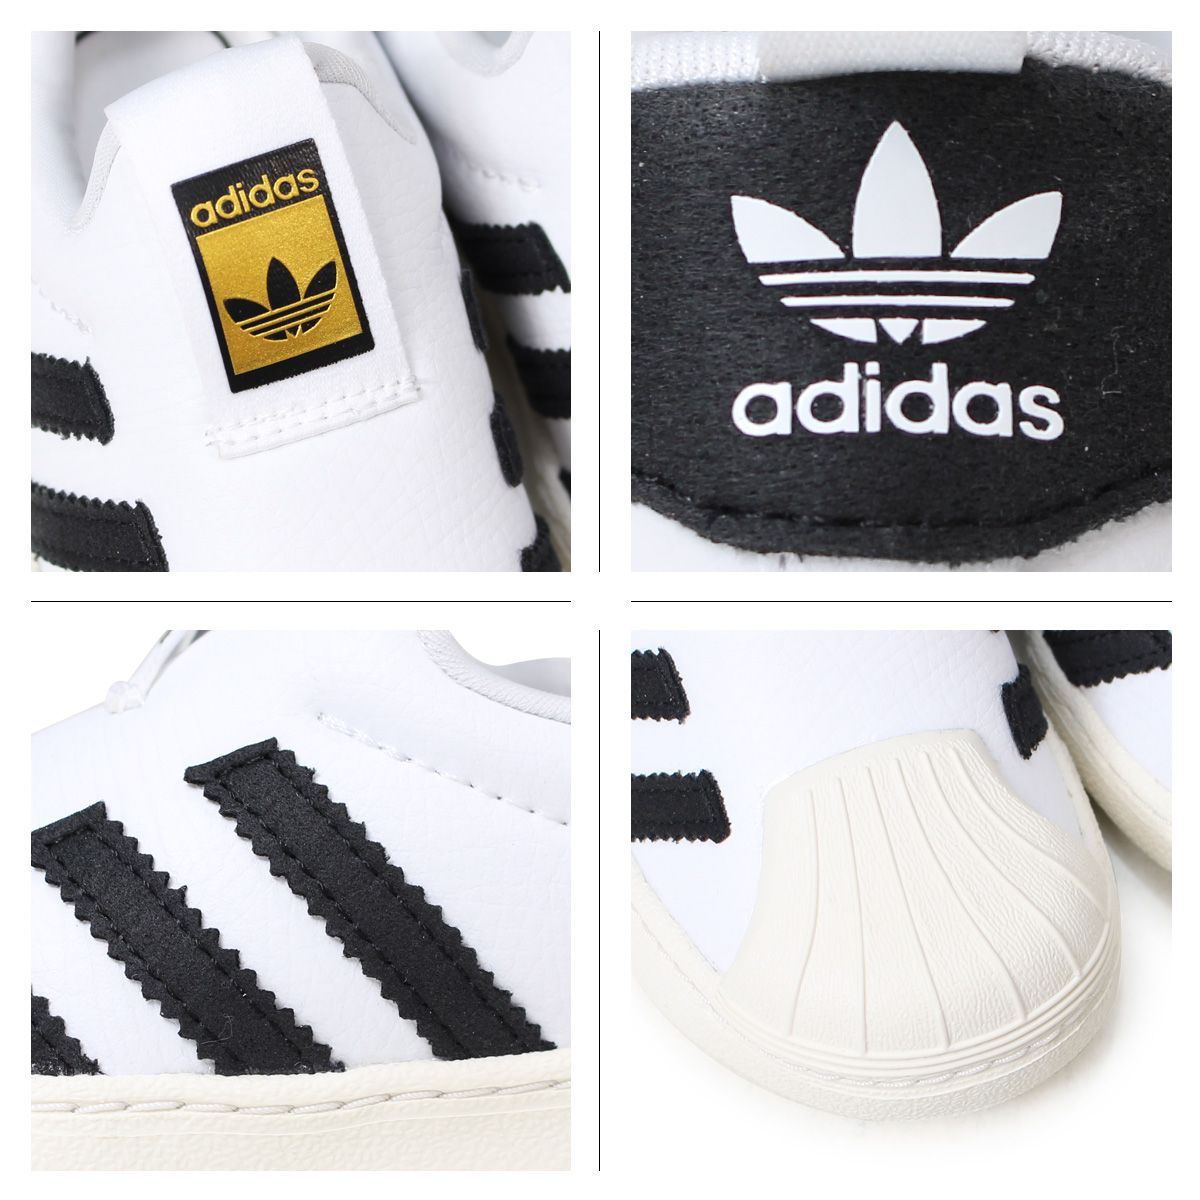 Adidas Superstar Bambini 5W3T5M76z4